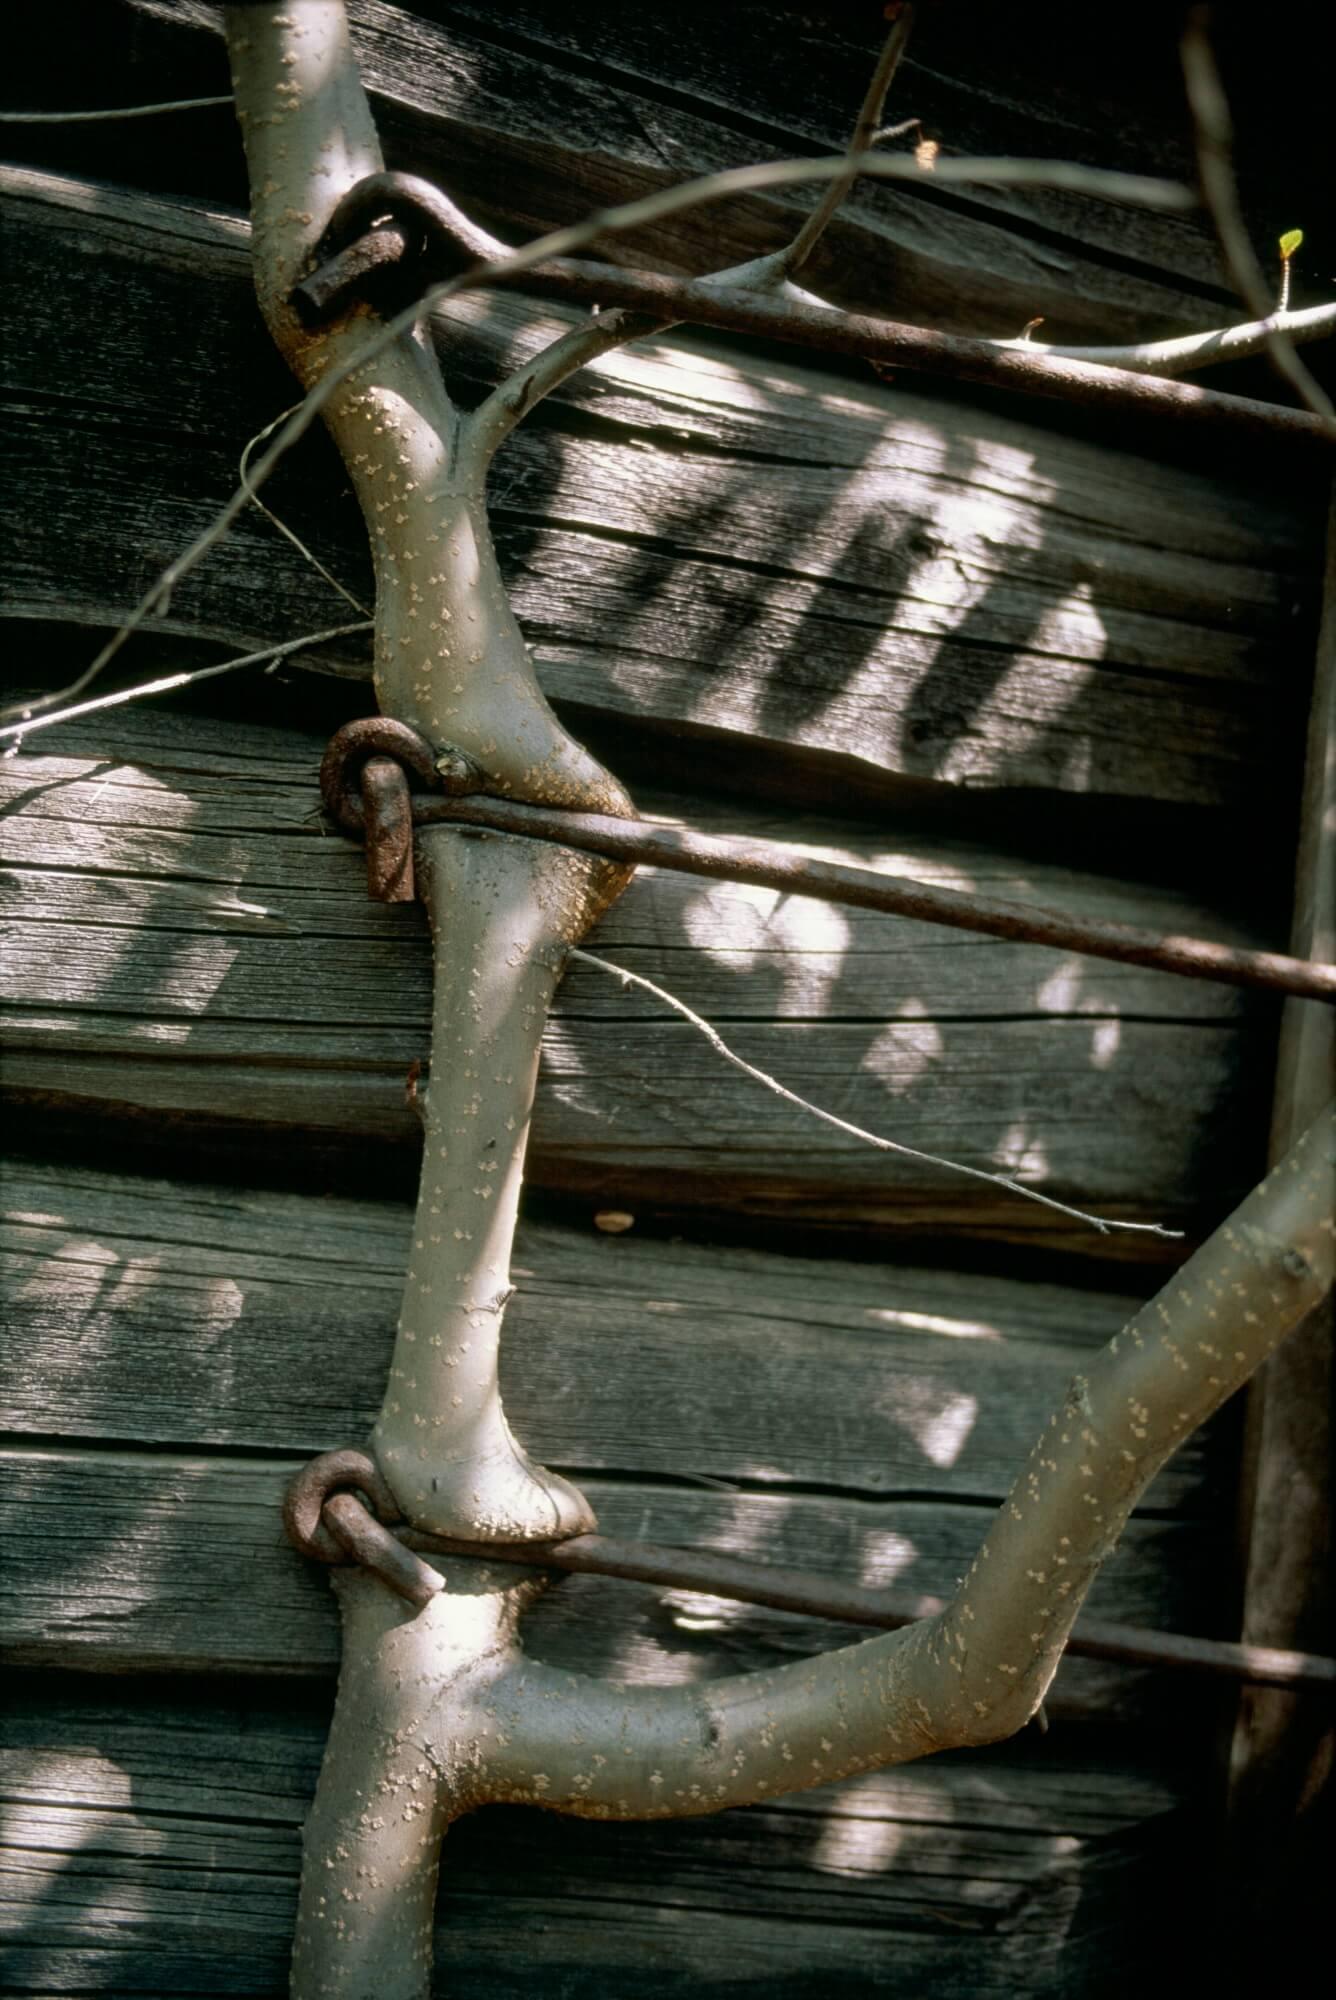 Fédération de Russie, Camp 507, Cap Nevelsky, 1999. - © Reza